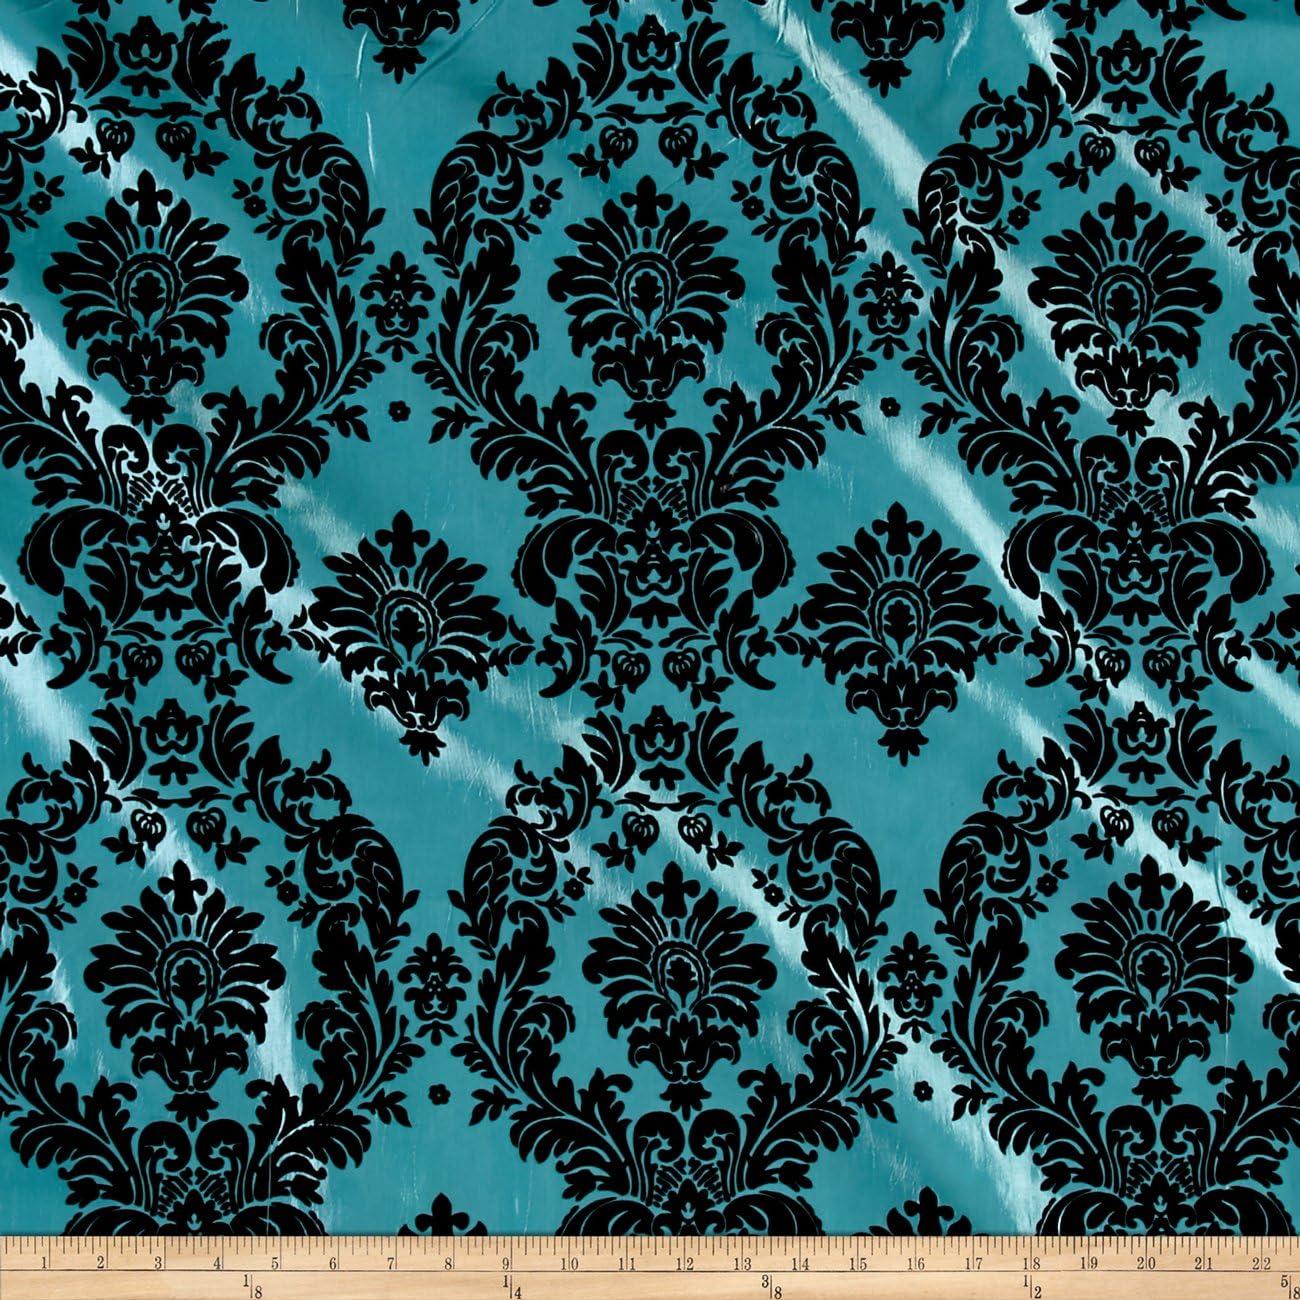 Amazon.com: Ben Textiles Flocked Damask Taffetta Aqua Blue/Black